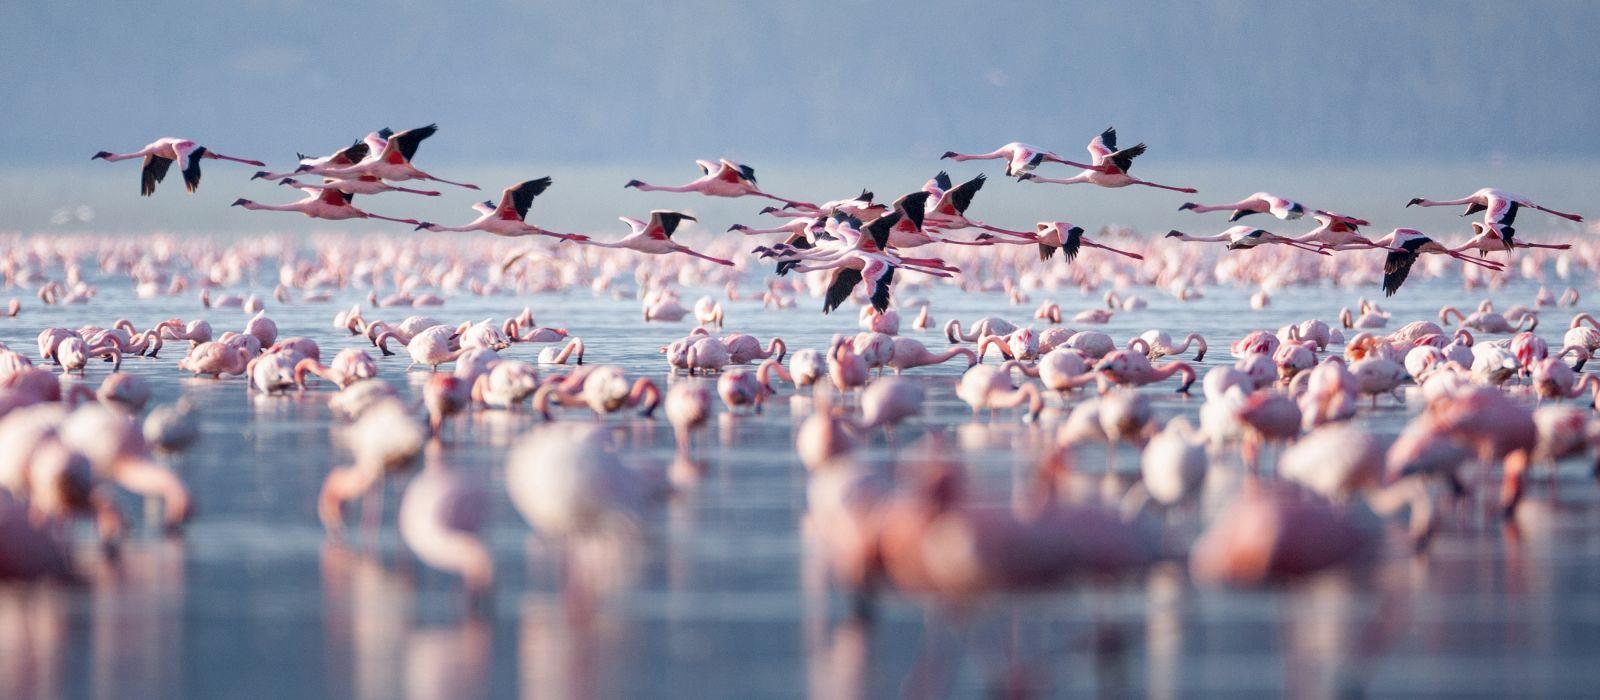 Fliegender Flamingo im Lake Nakuru, Kenia, Afrika